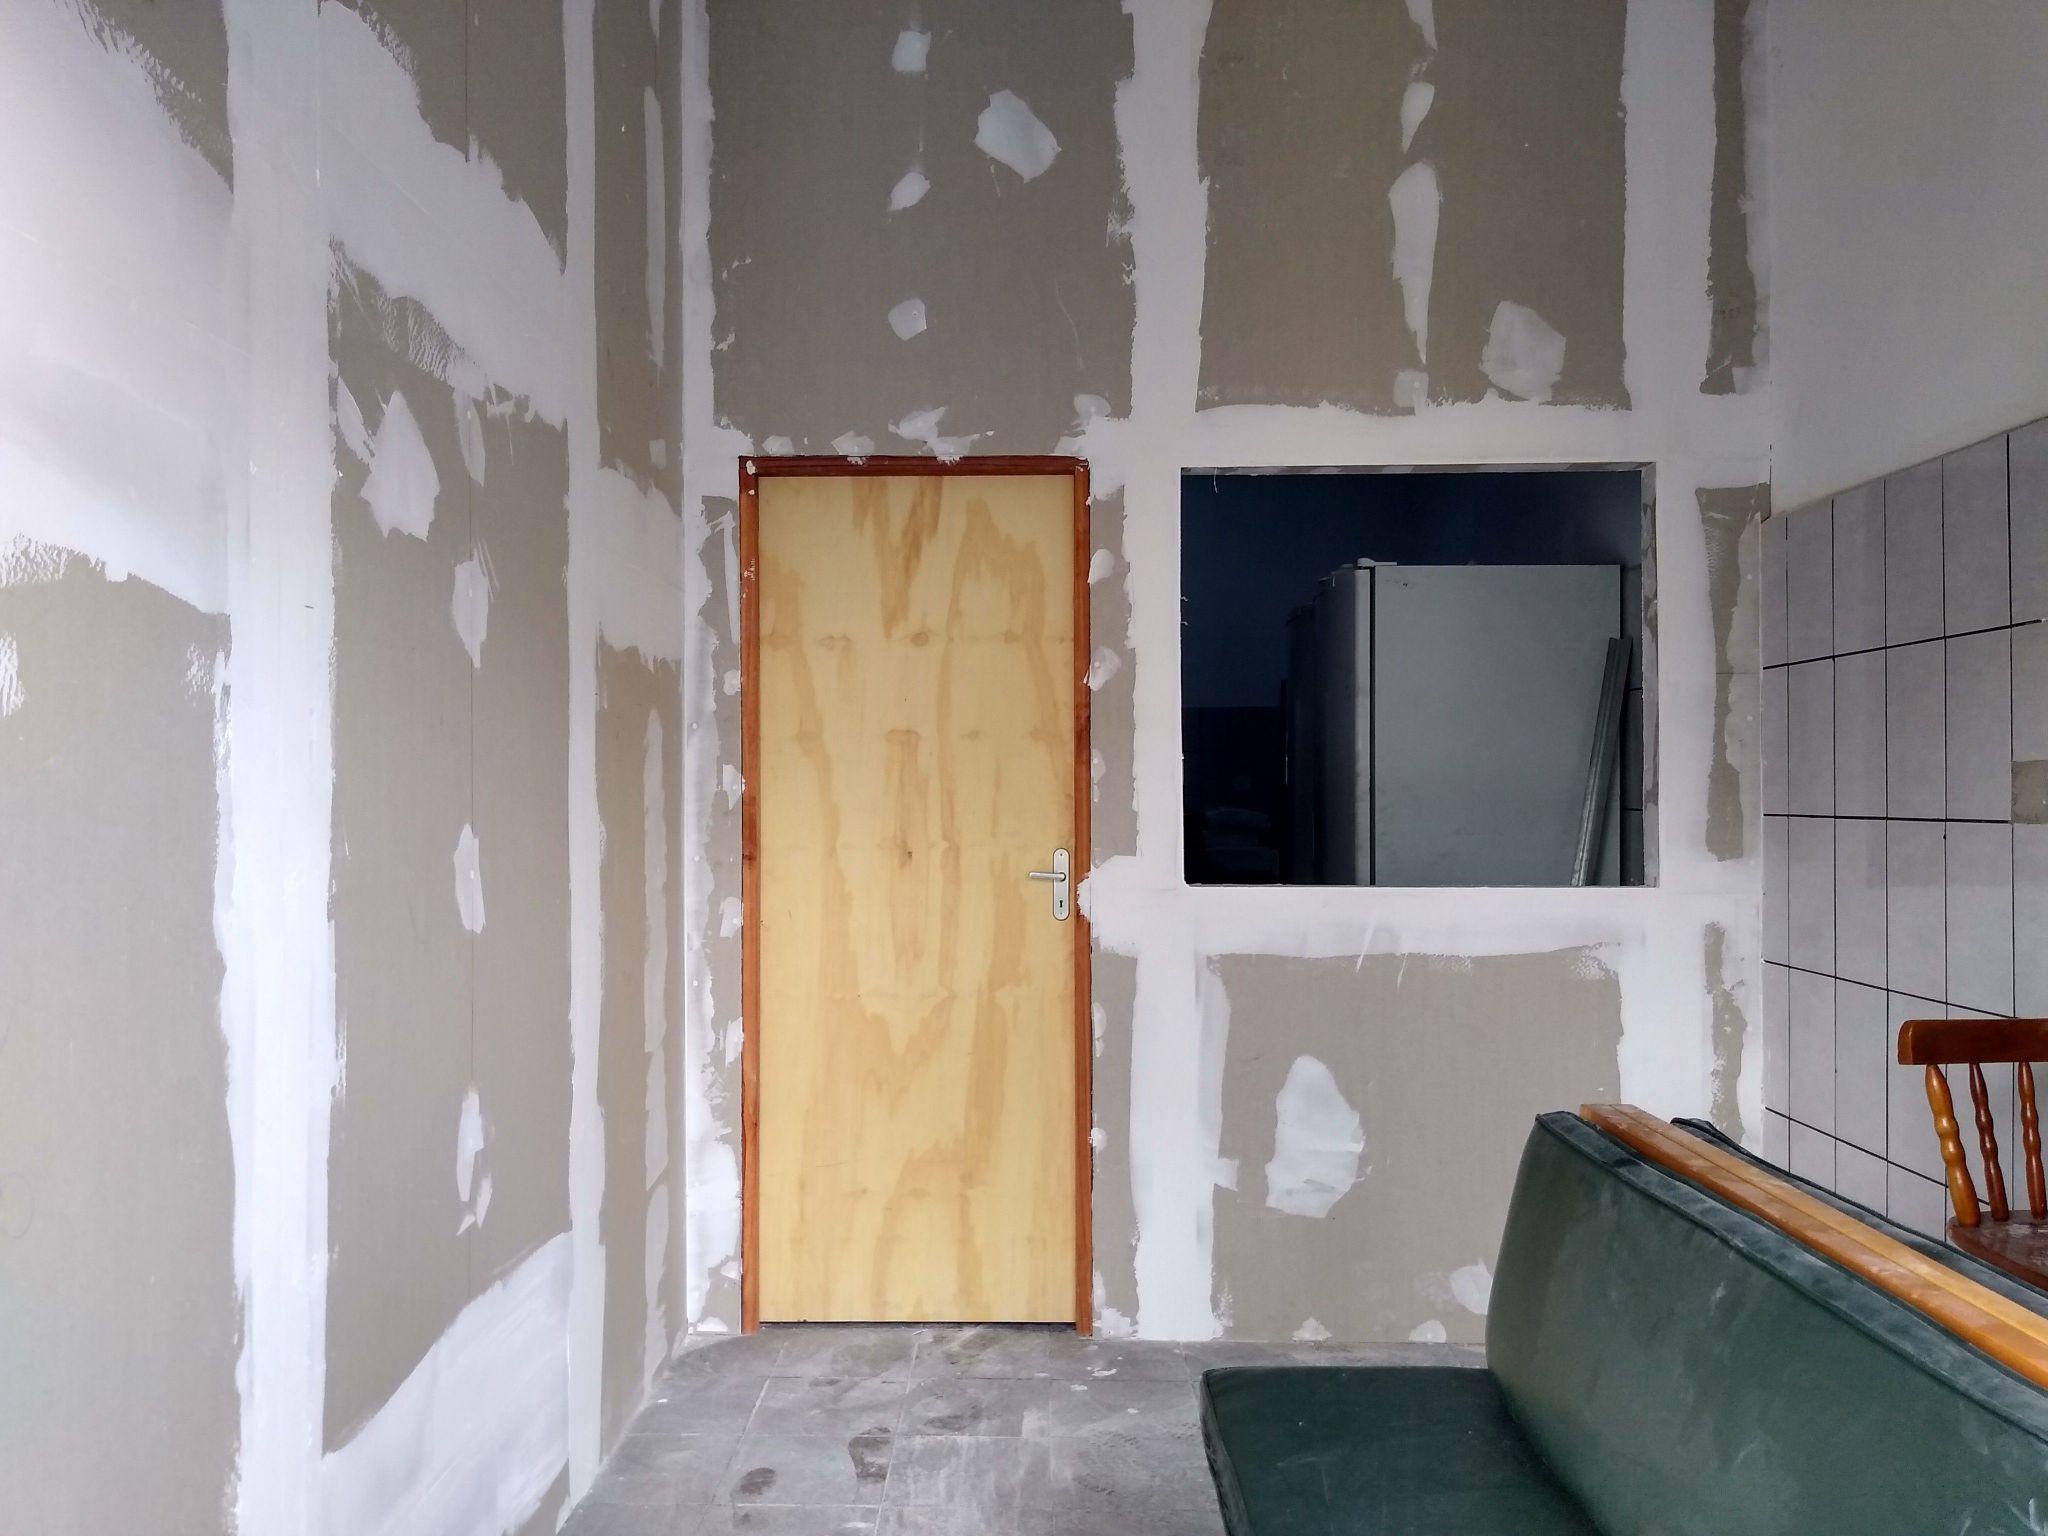 Drywall com porta e janela.